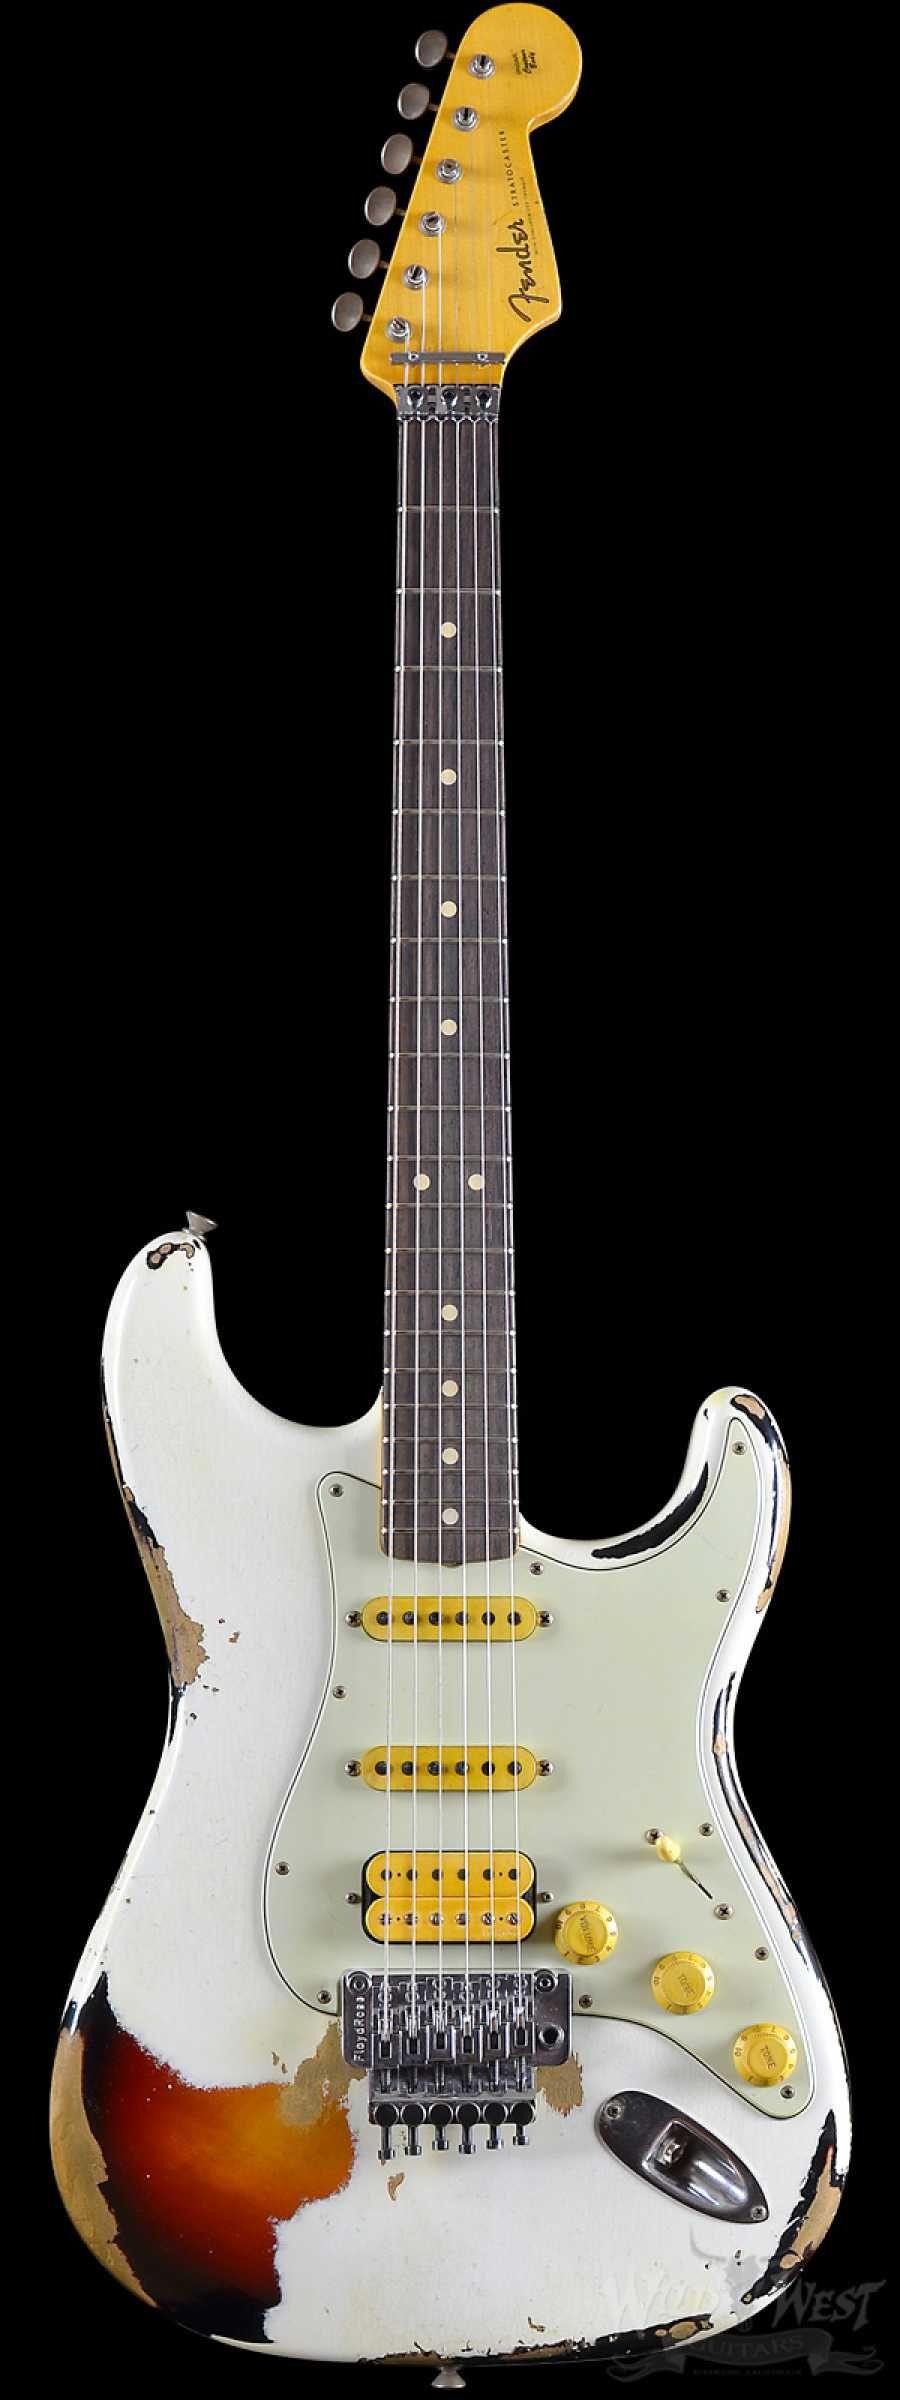 Fender Custom Shop White Lightning Stratocaster Hss Floyd Rose Heavy Relic Rosewood Board 22 Frets 3 Tone Sunburst Cool Electric Guitars Guitar Floyd Rose